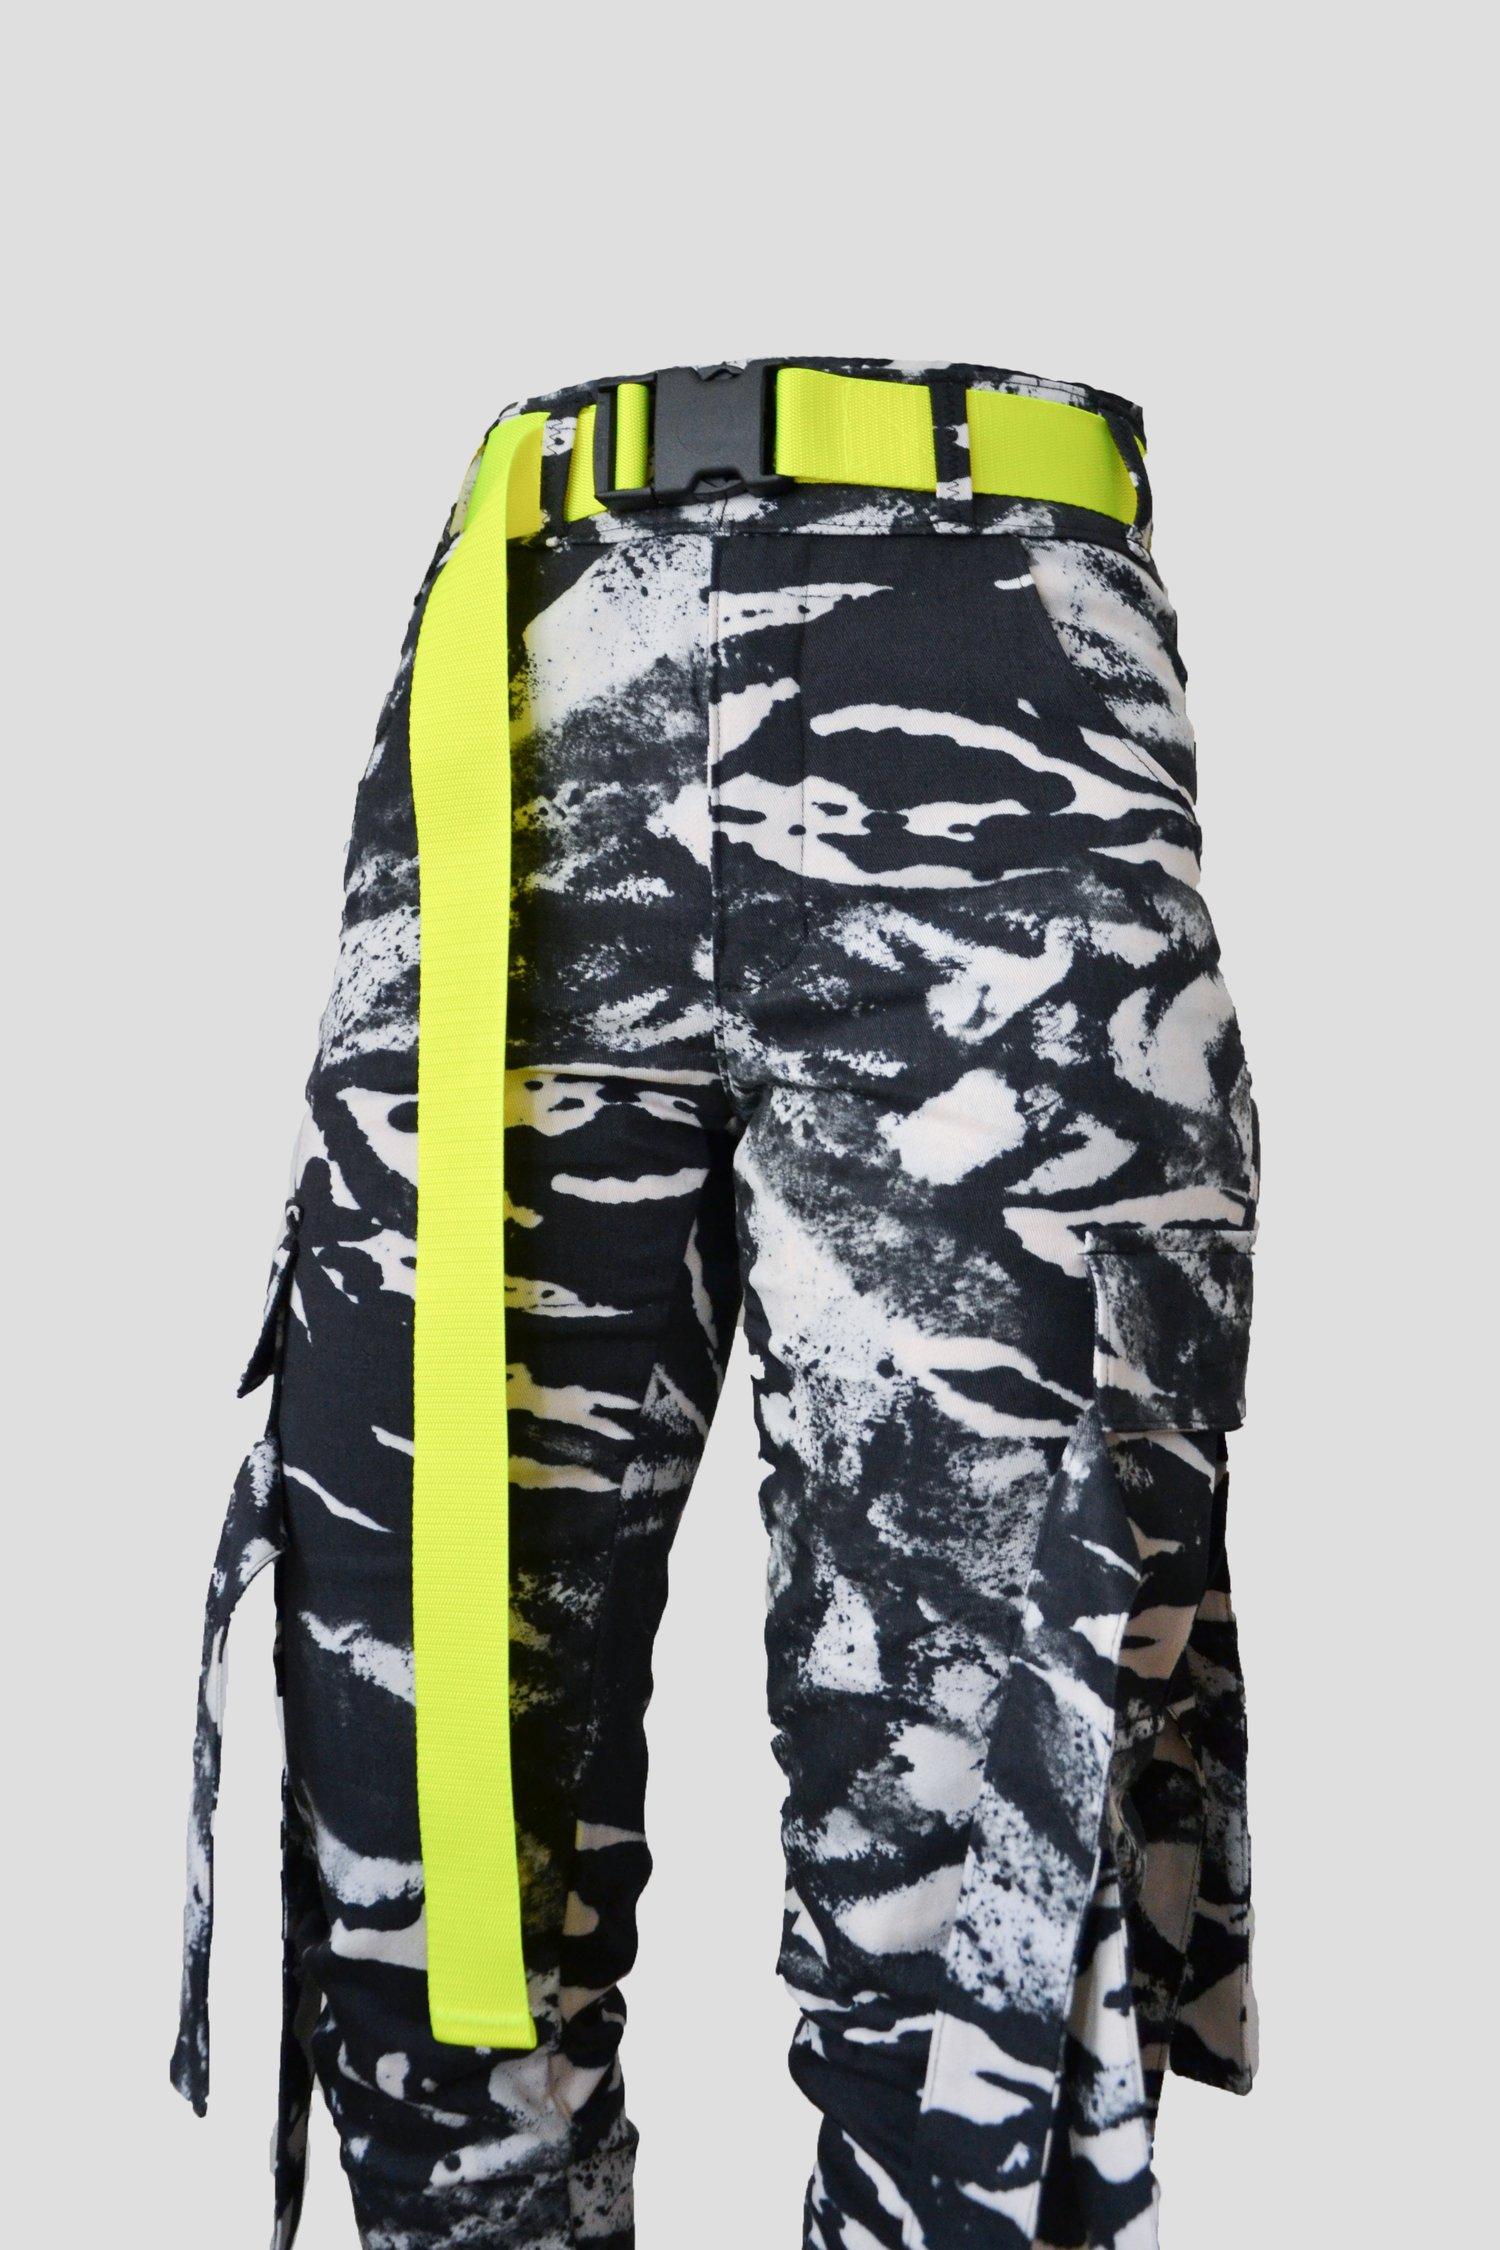 Image of cargo pants - abstract zebra